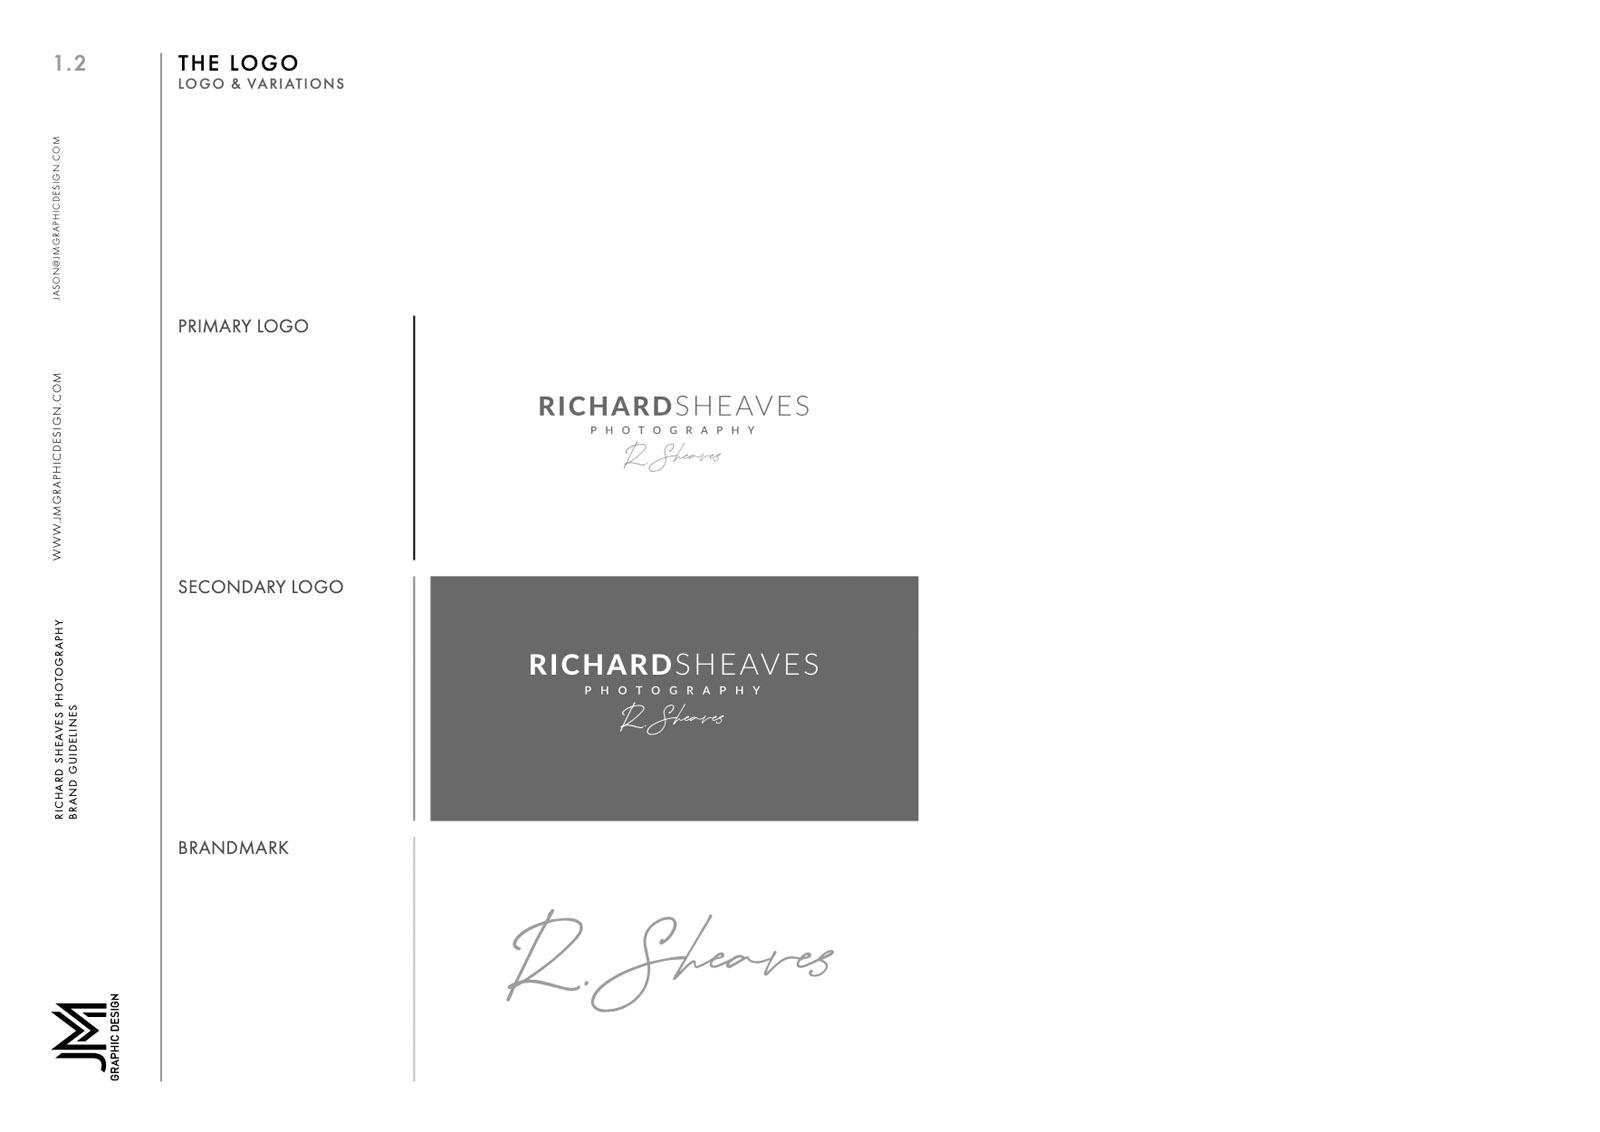 brand-identity-design-documentary-photographer-08